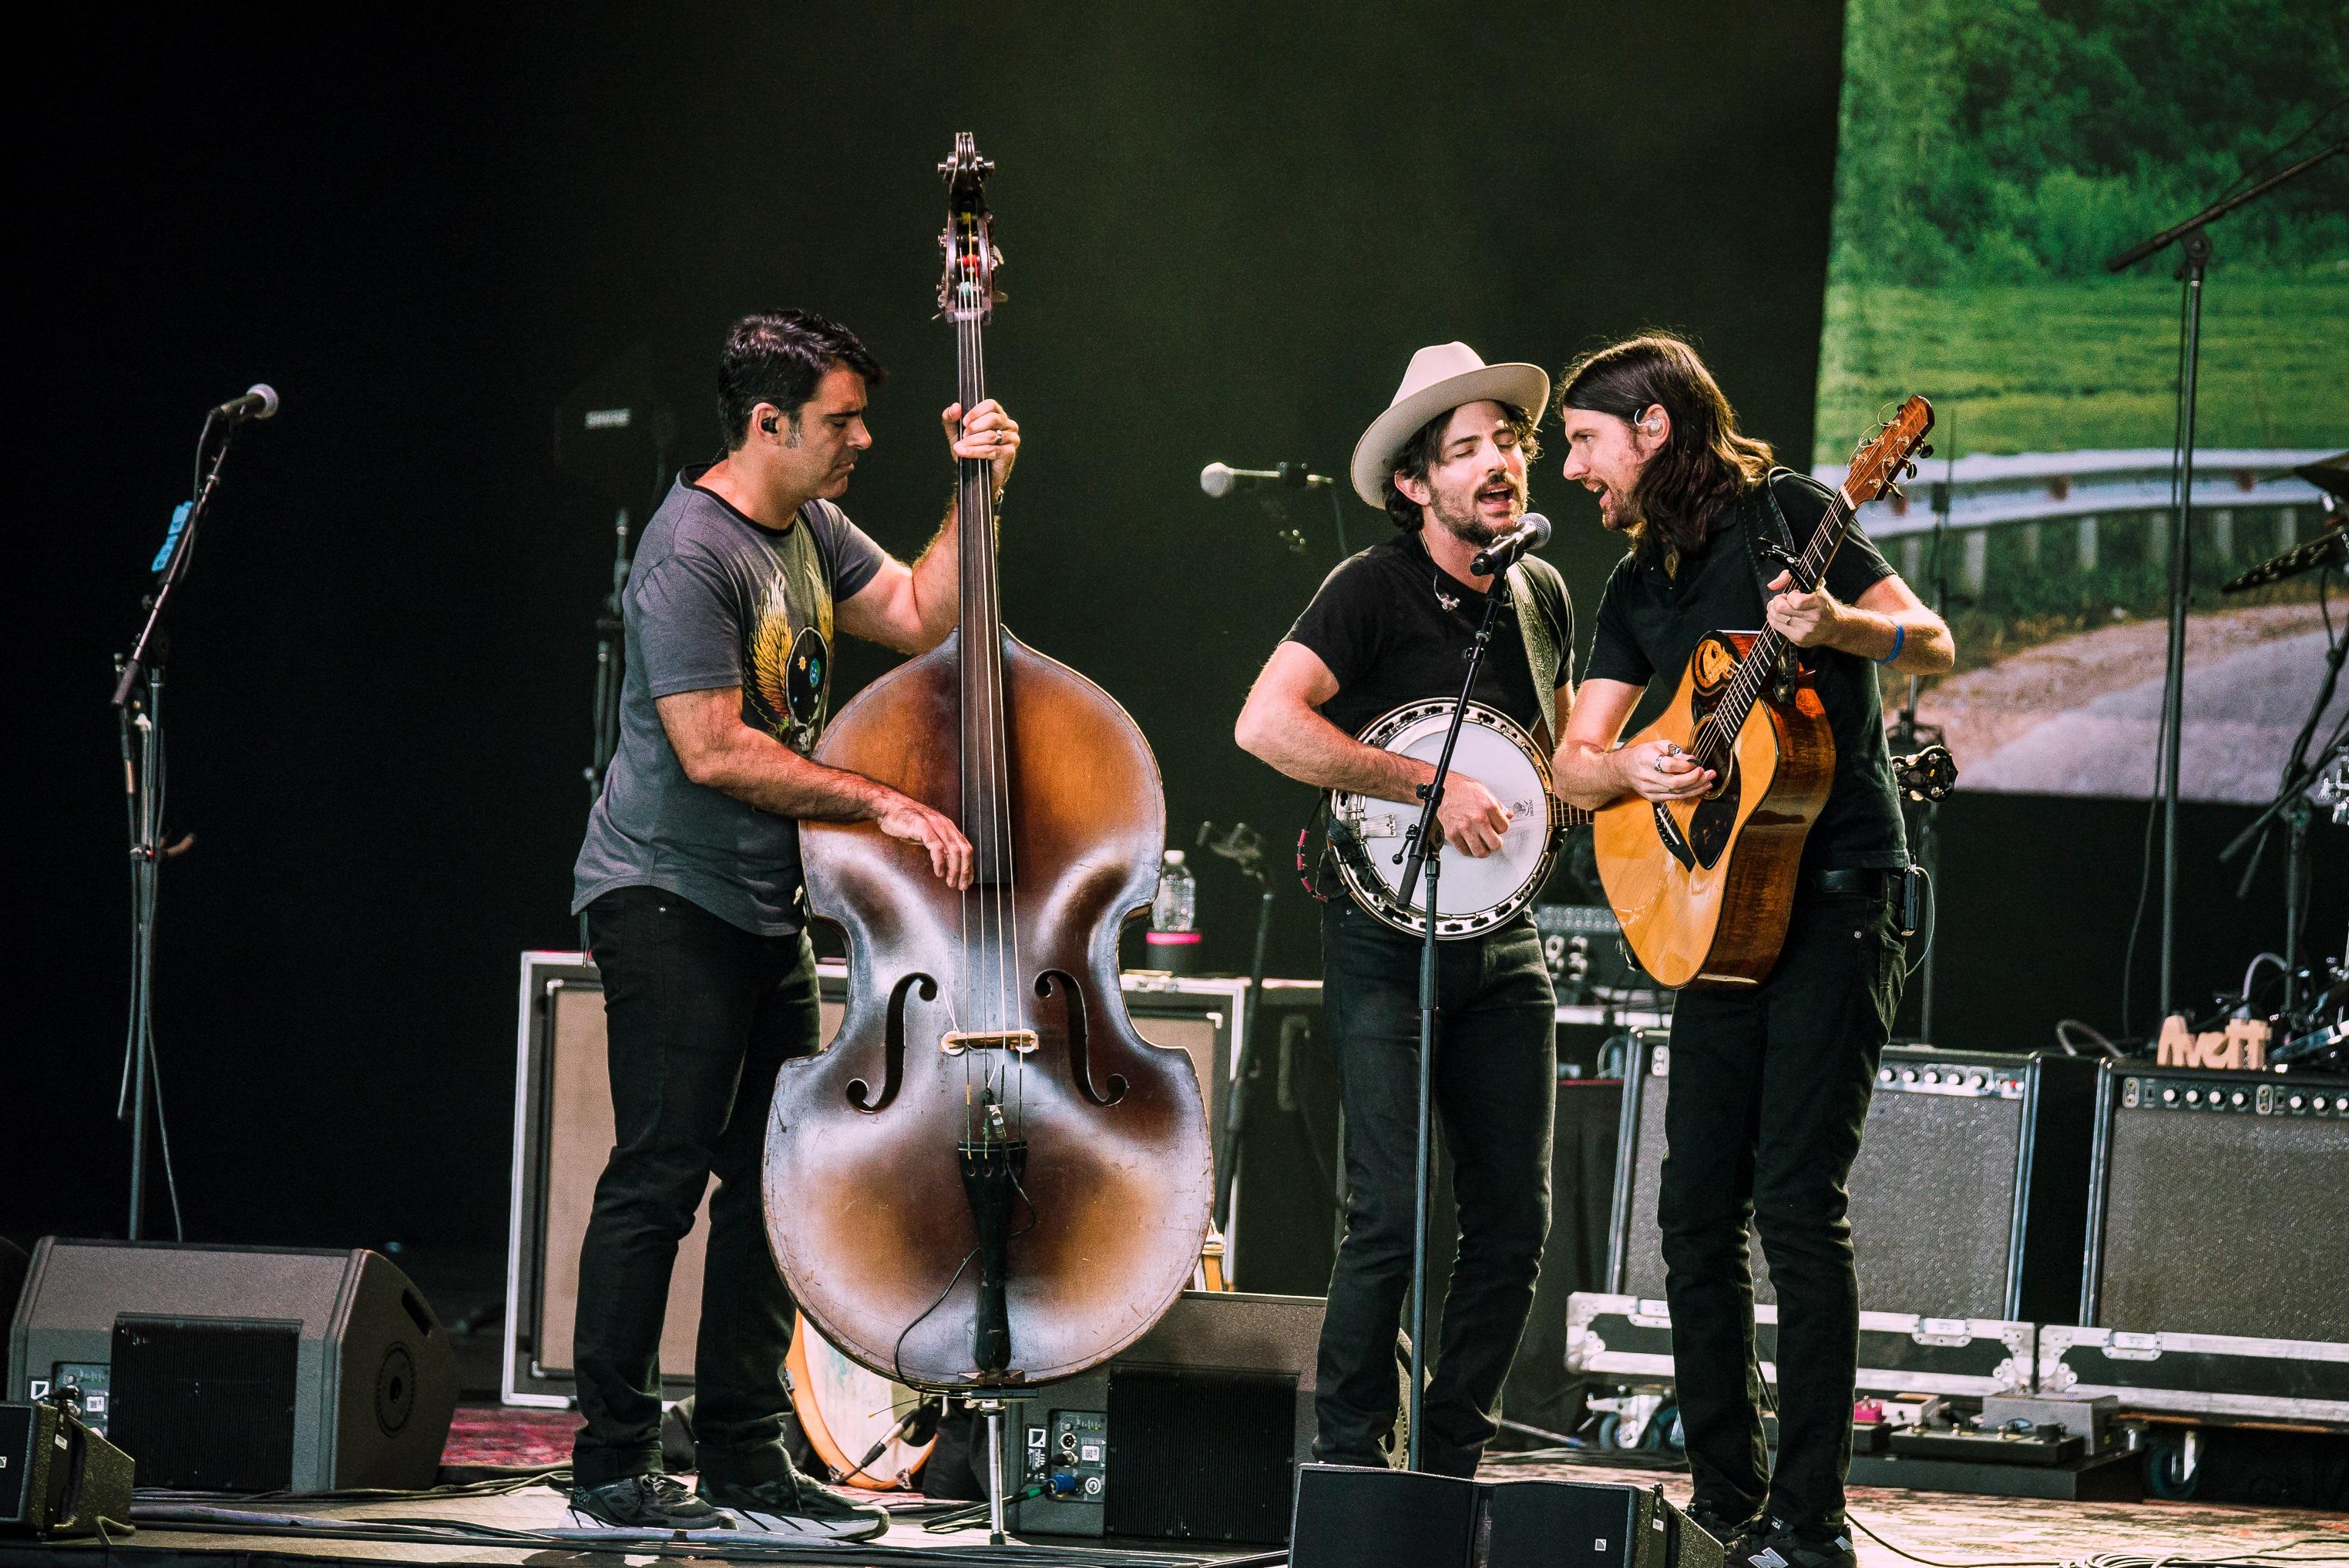 The Avett Brothers; Photo credit: Andrew Wendowski/Sounds Like Nashville